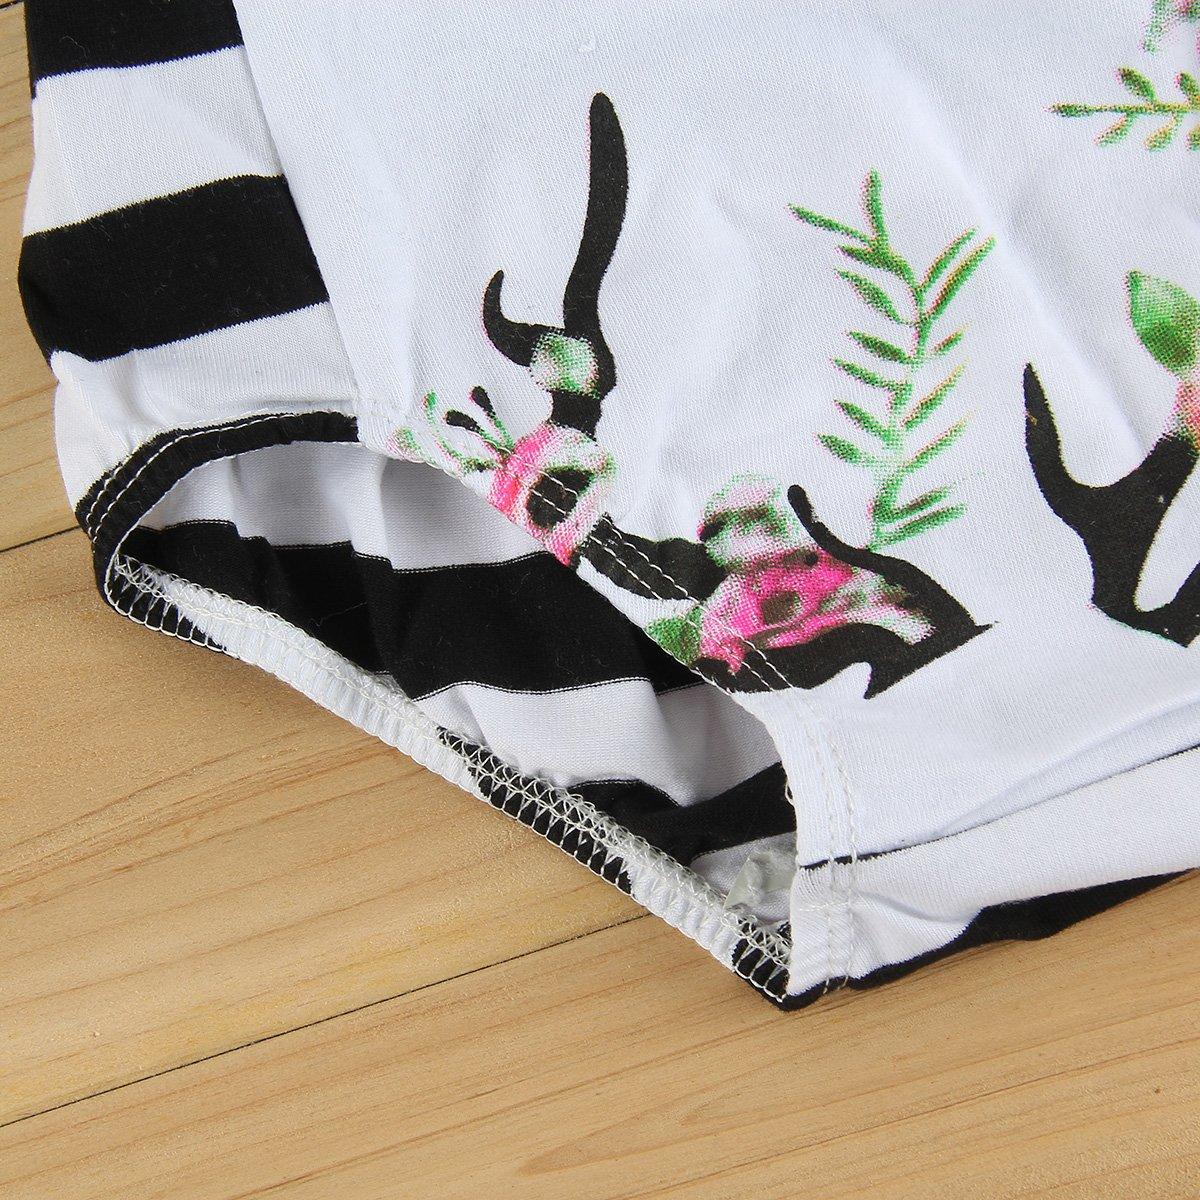 Puseky Baby Girls Reindeer Elk Bodysuit Strap Romper Playsuit Jumpsuit Outfits 6-12 Months, White+Black